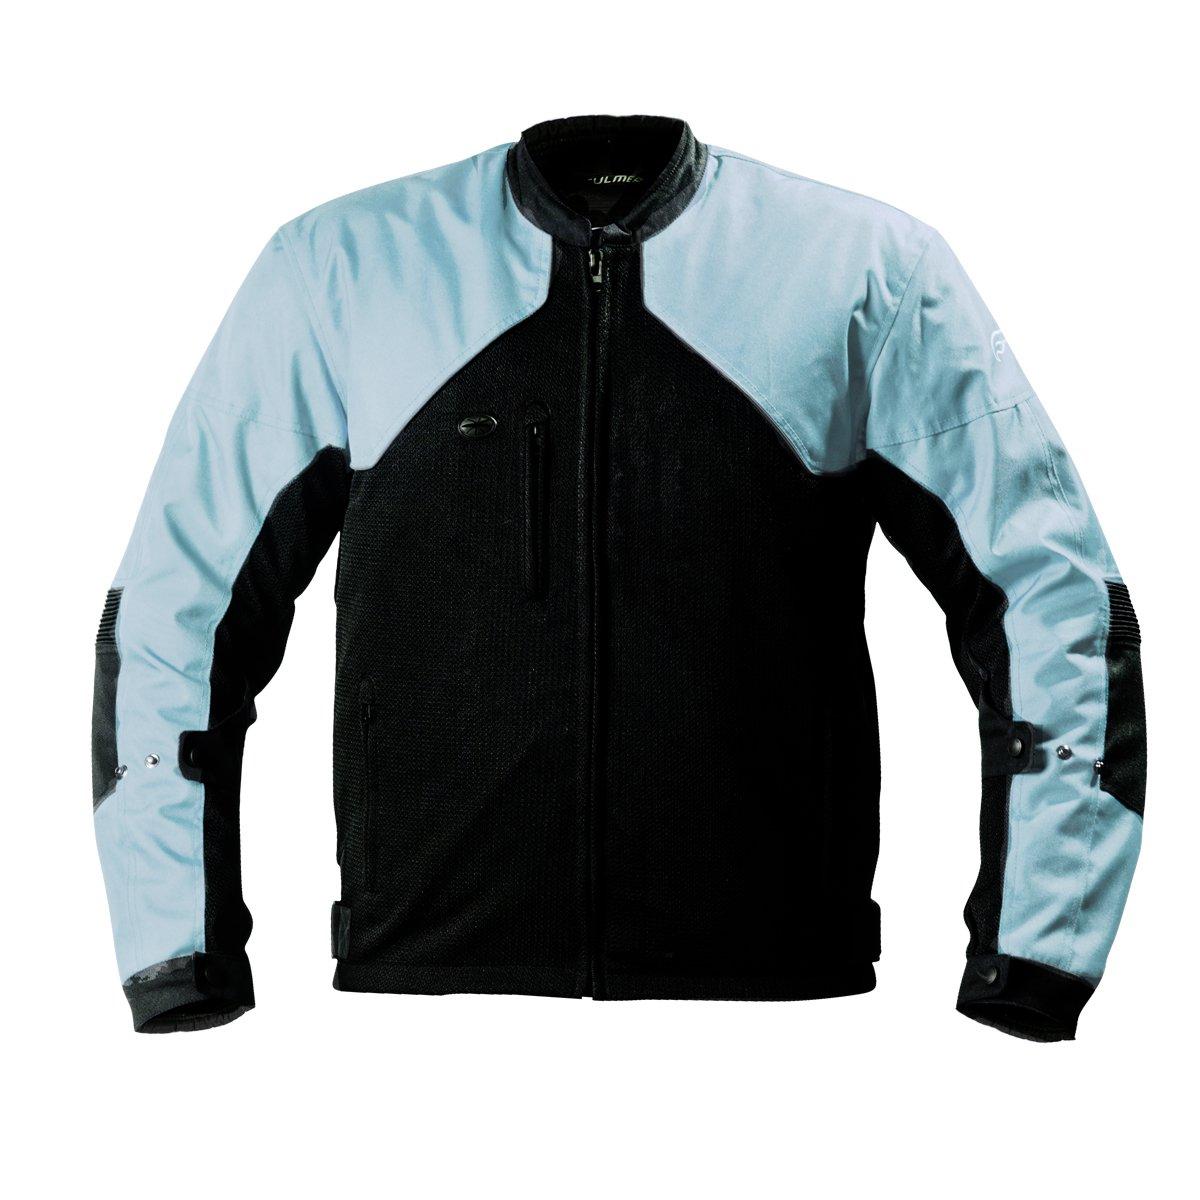 Pink LJ134PNKM M Womens Supertrak II Motorcycle Jacket Textile//Mesh CE Armor Fulmer